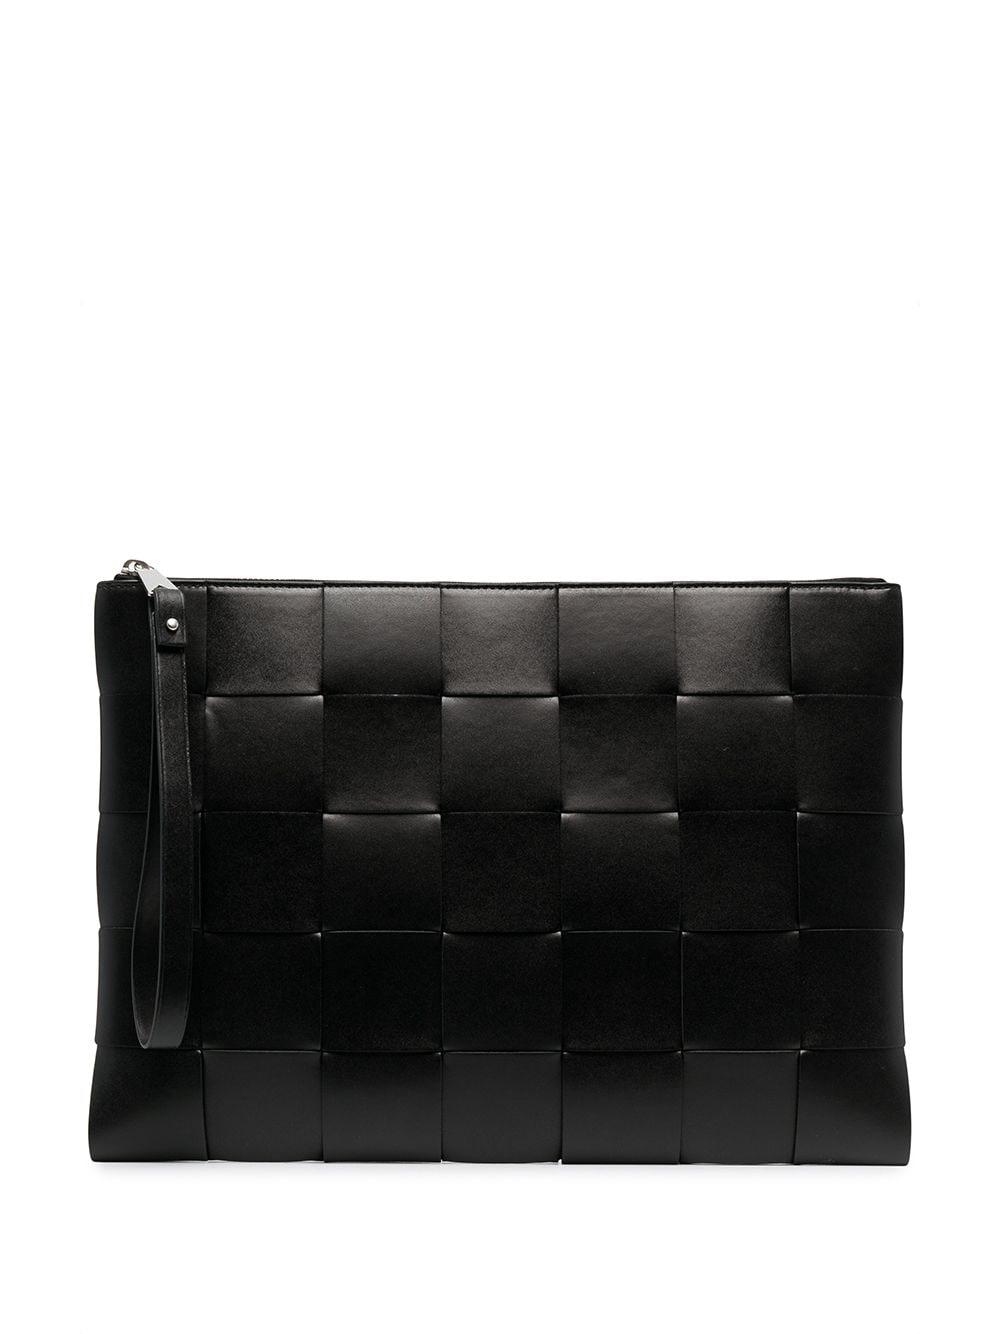 Picture of Bottega Veneta   Intrecciato Clutch Bag